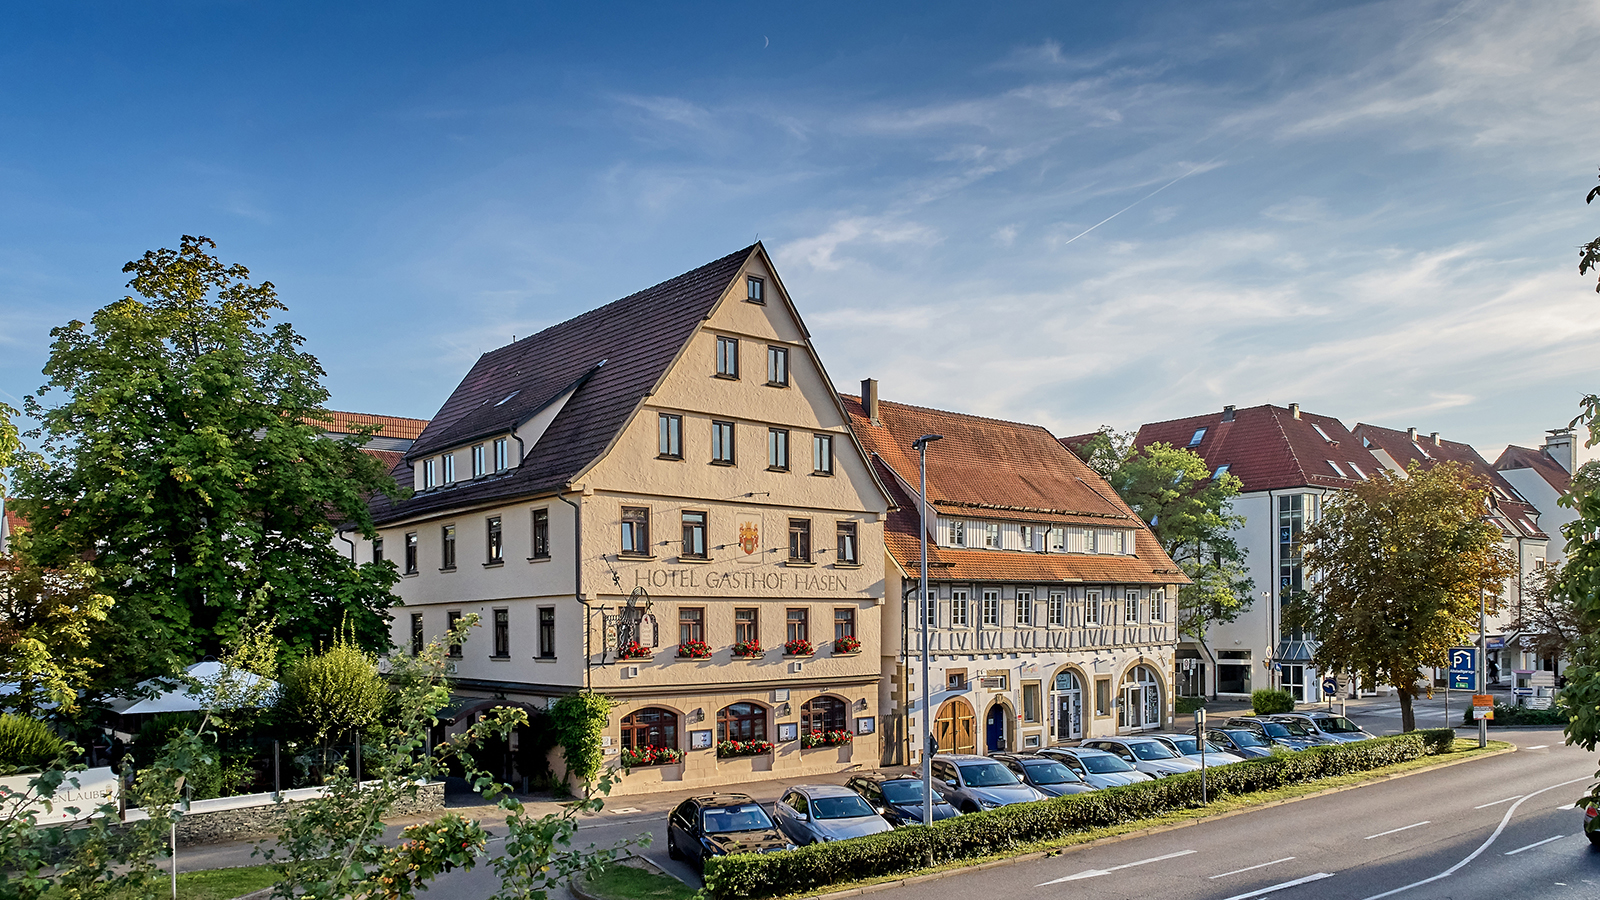 Bild 1 Hotel Gasthof Hasen